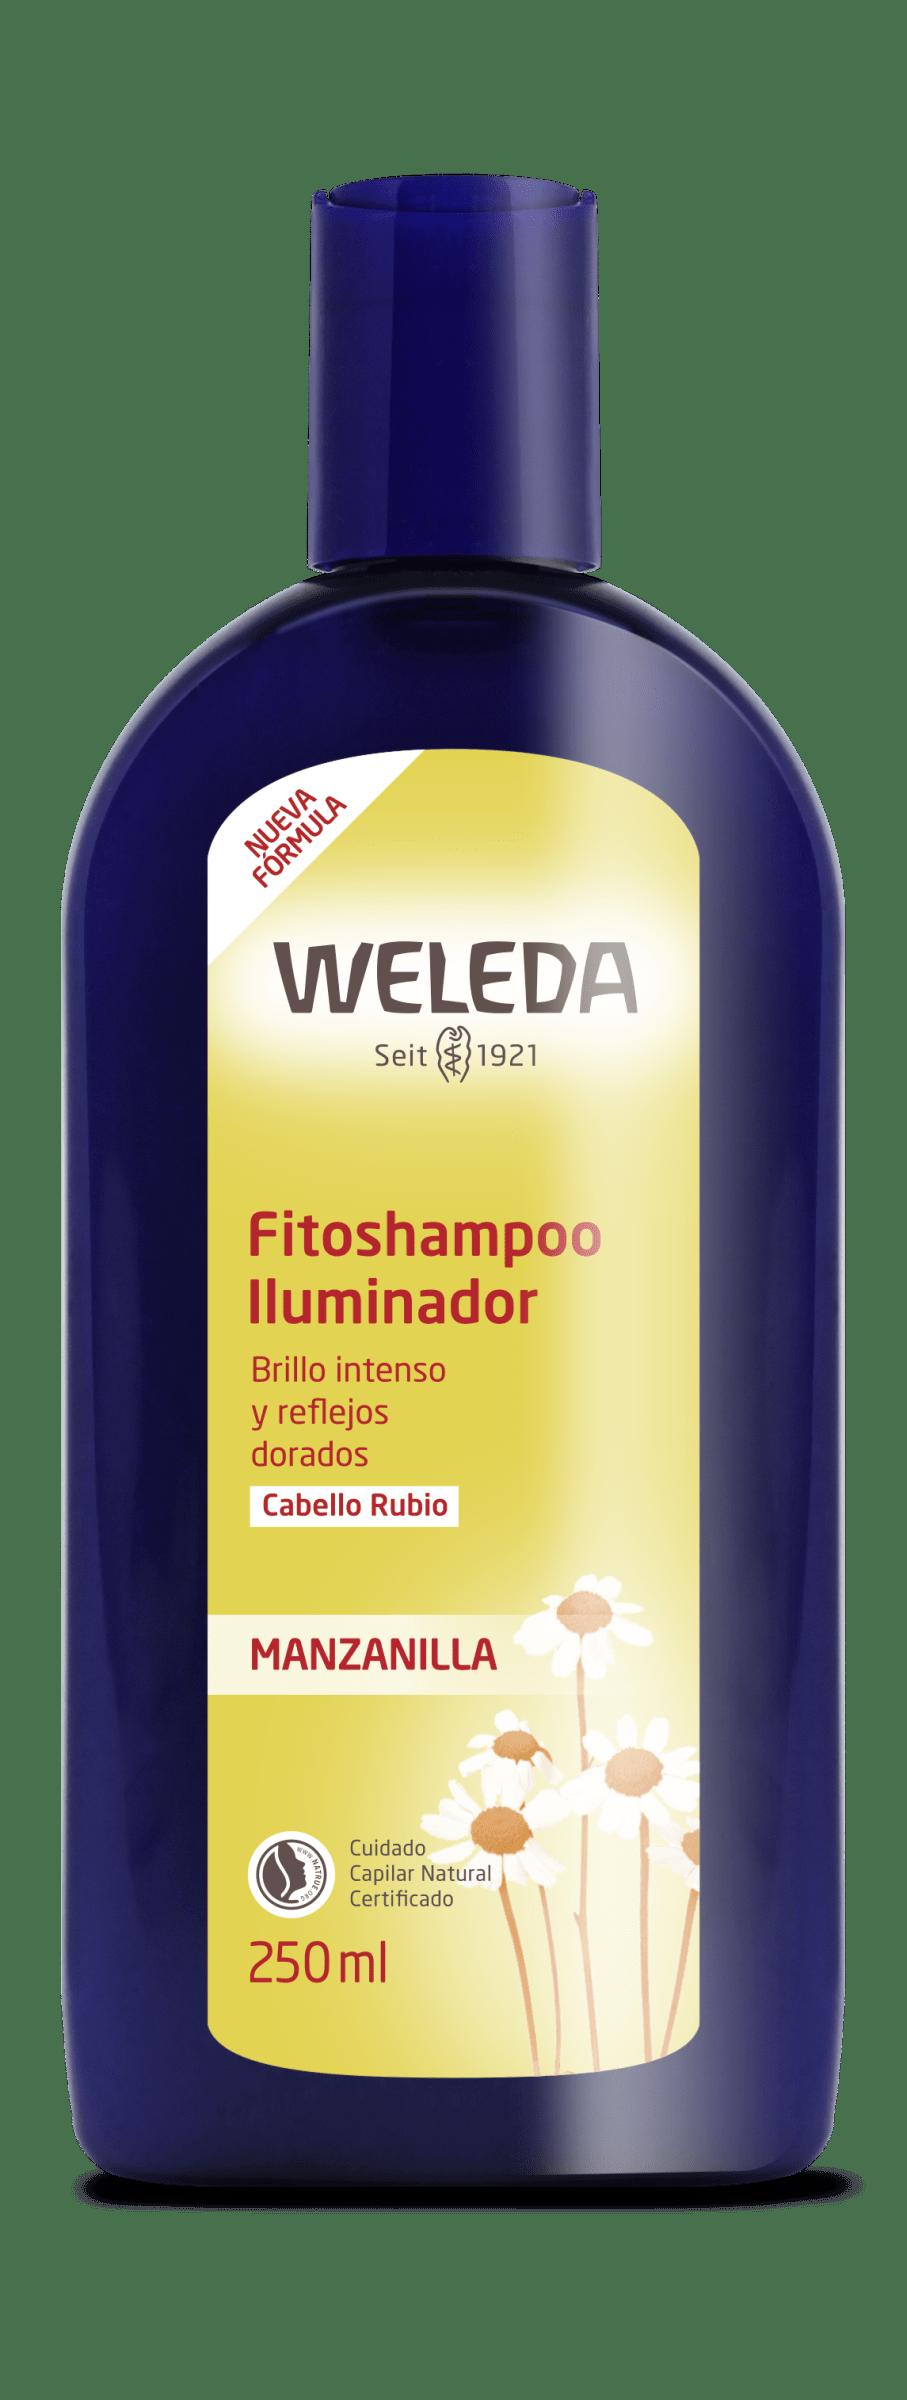 FITOSHAMPOO ILUMINADOR DE MANZANILLA - WELEDA